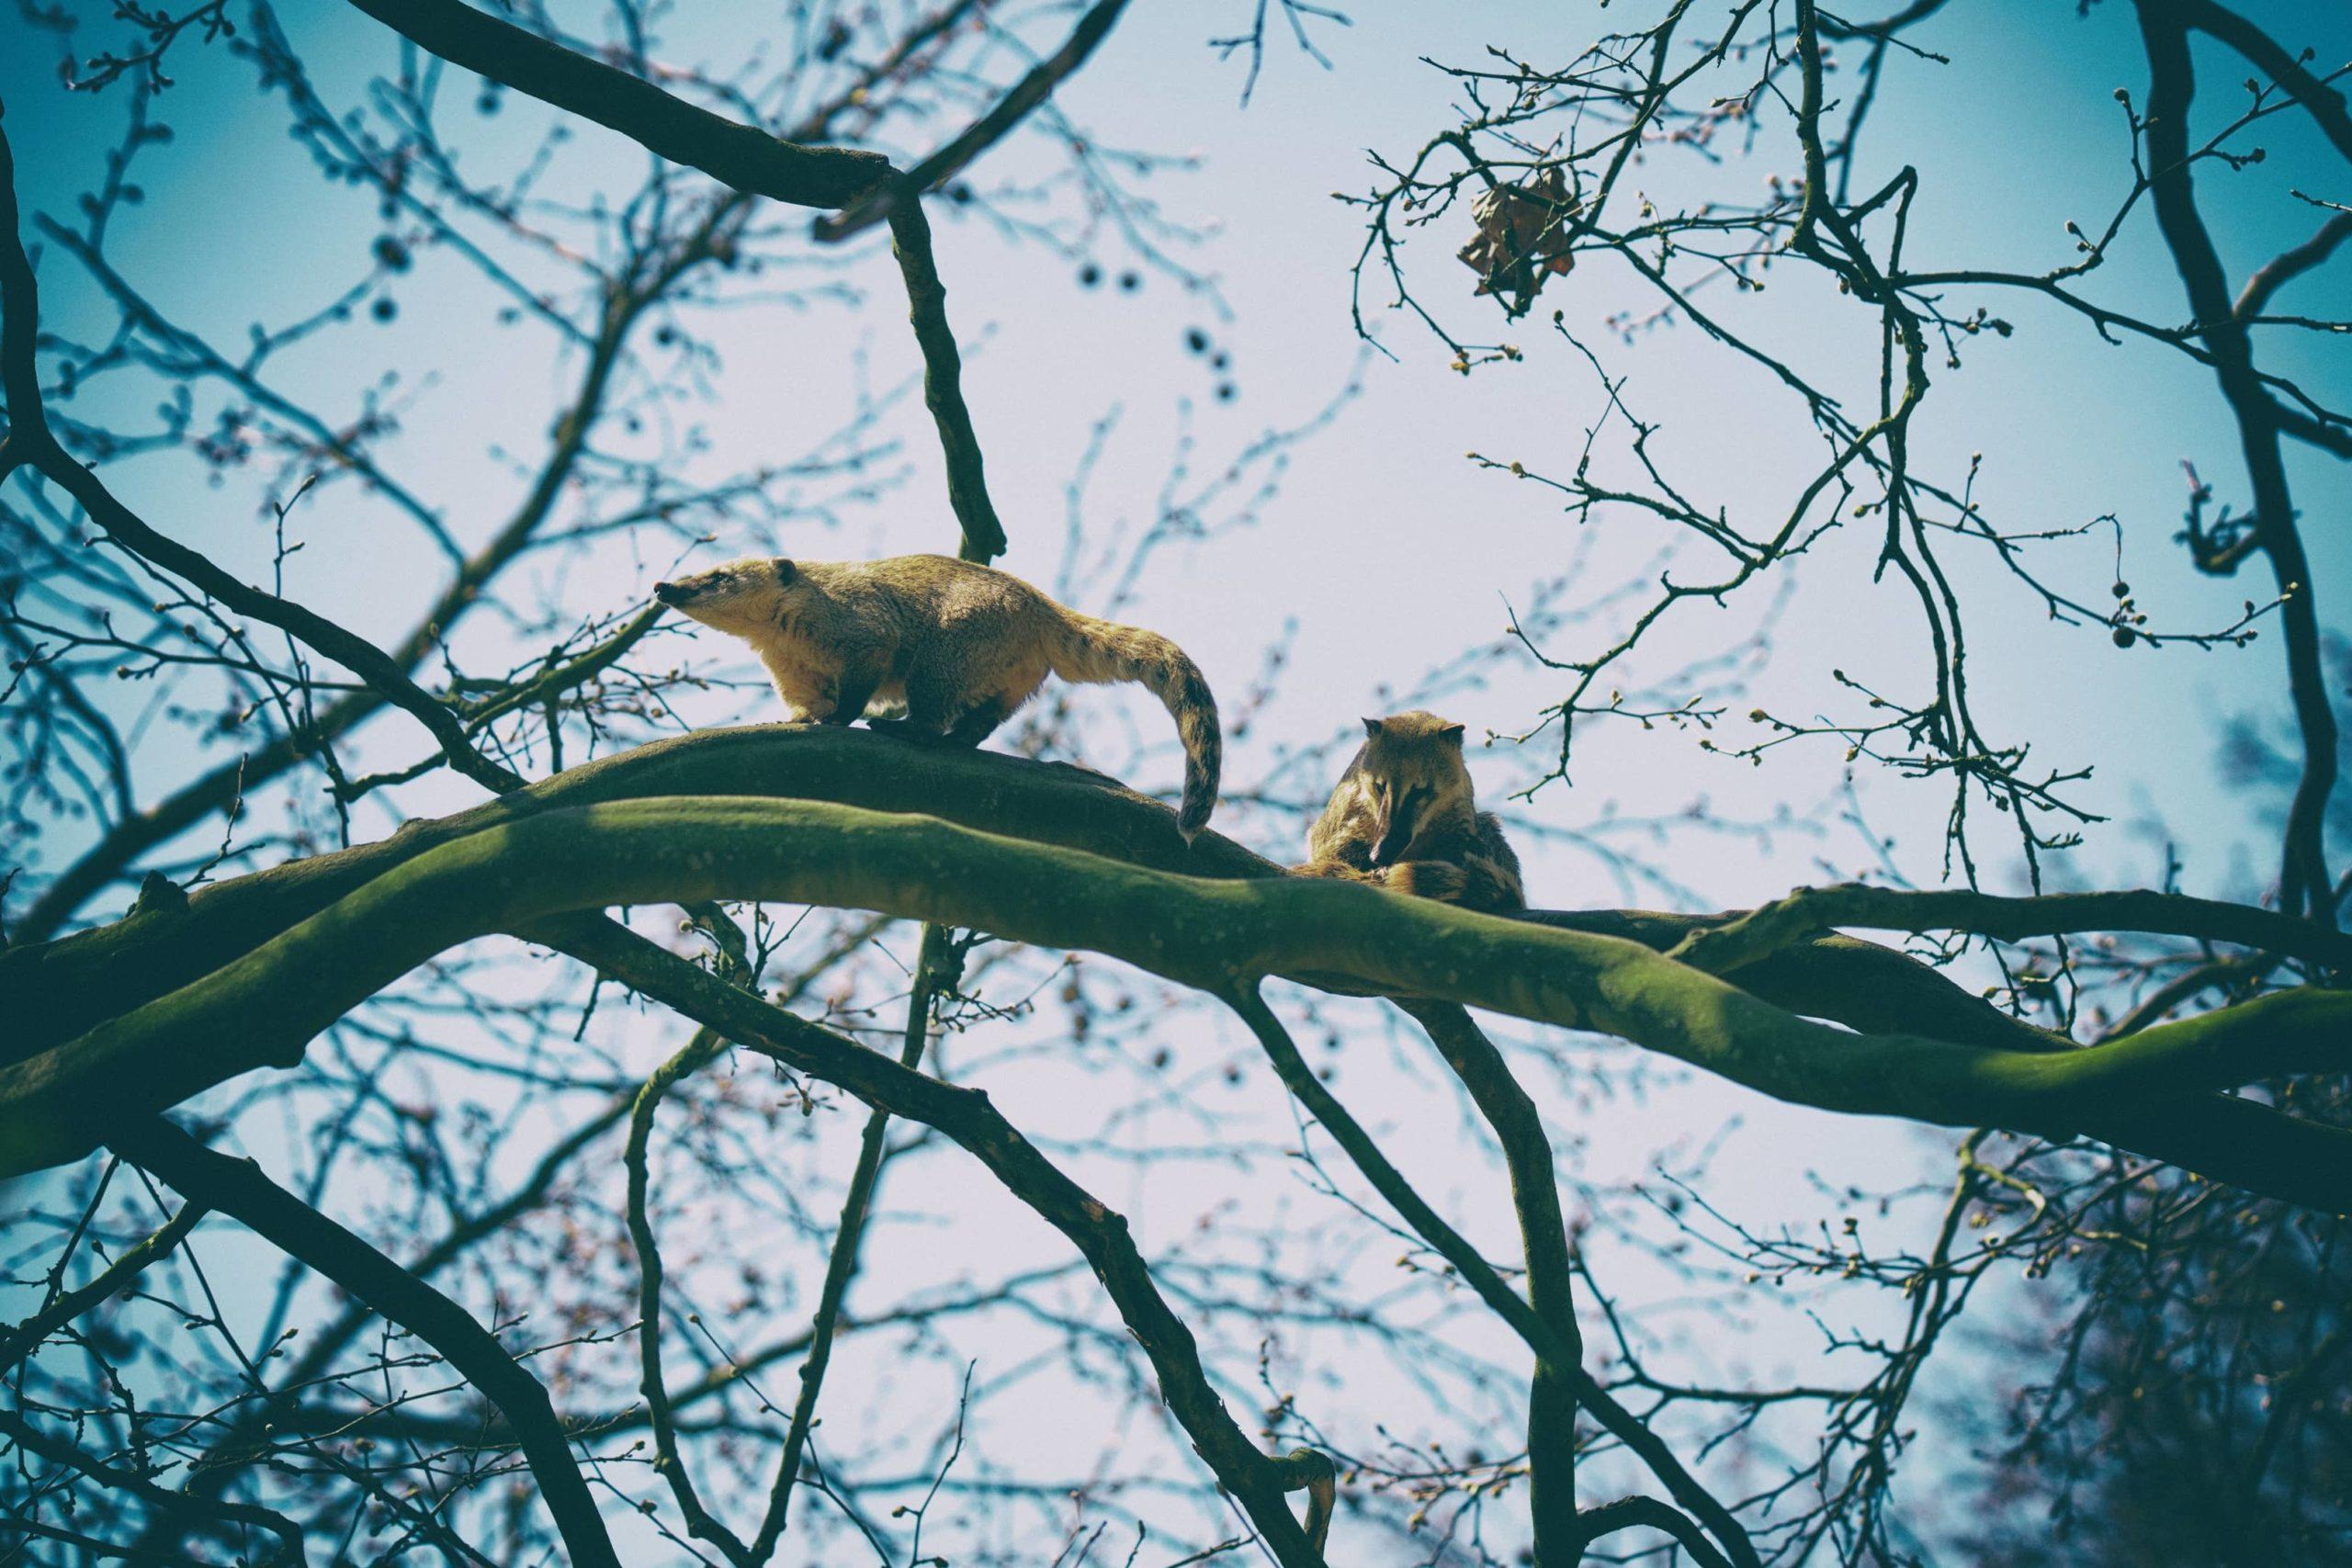 Nasenbär beim Fluchtversuch, fotografiert von Danny Koerber.